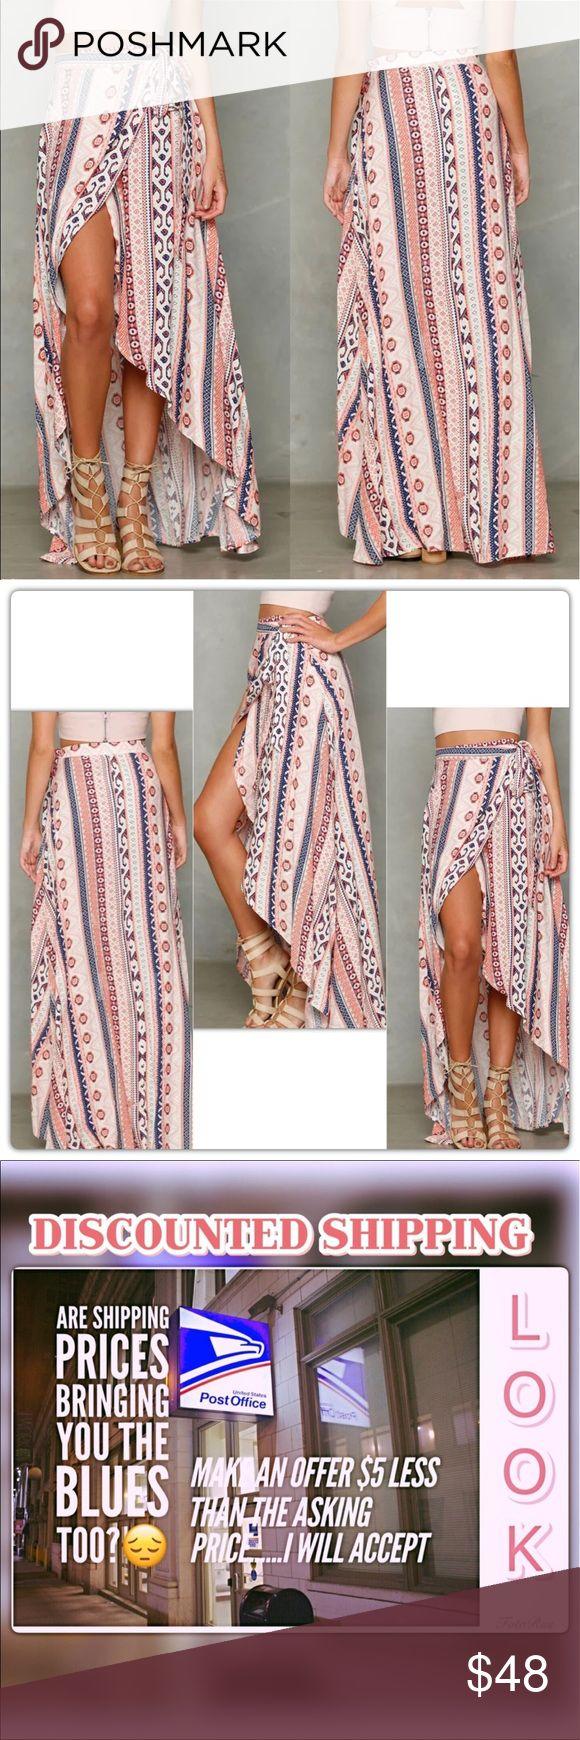 Beautiful Floral Tribal Maxi Skirt Made with chiffon material. Adjustable wrap waist. Skirts Maxi